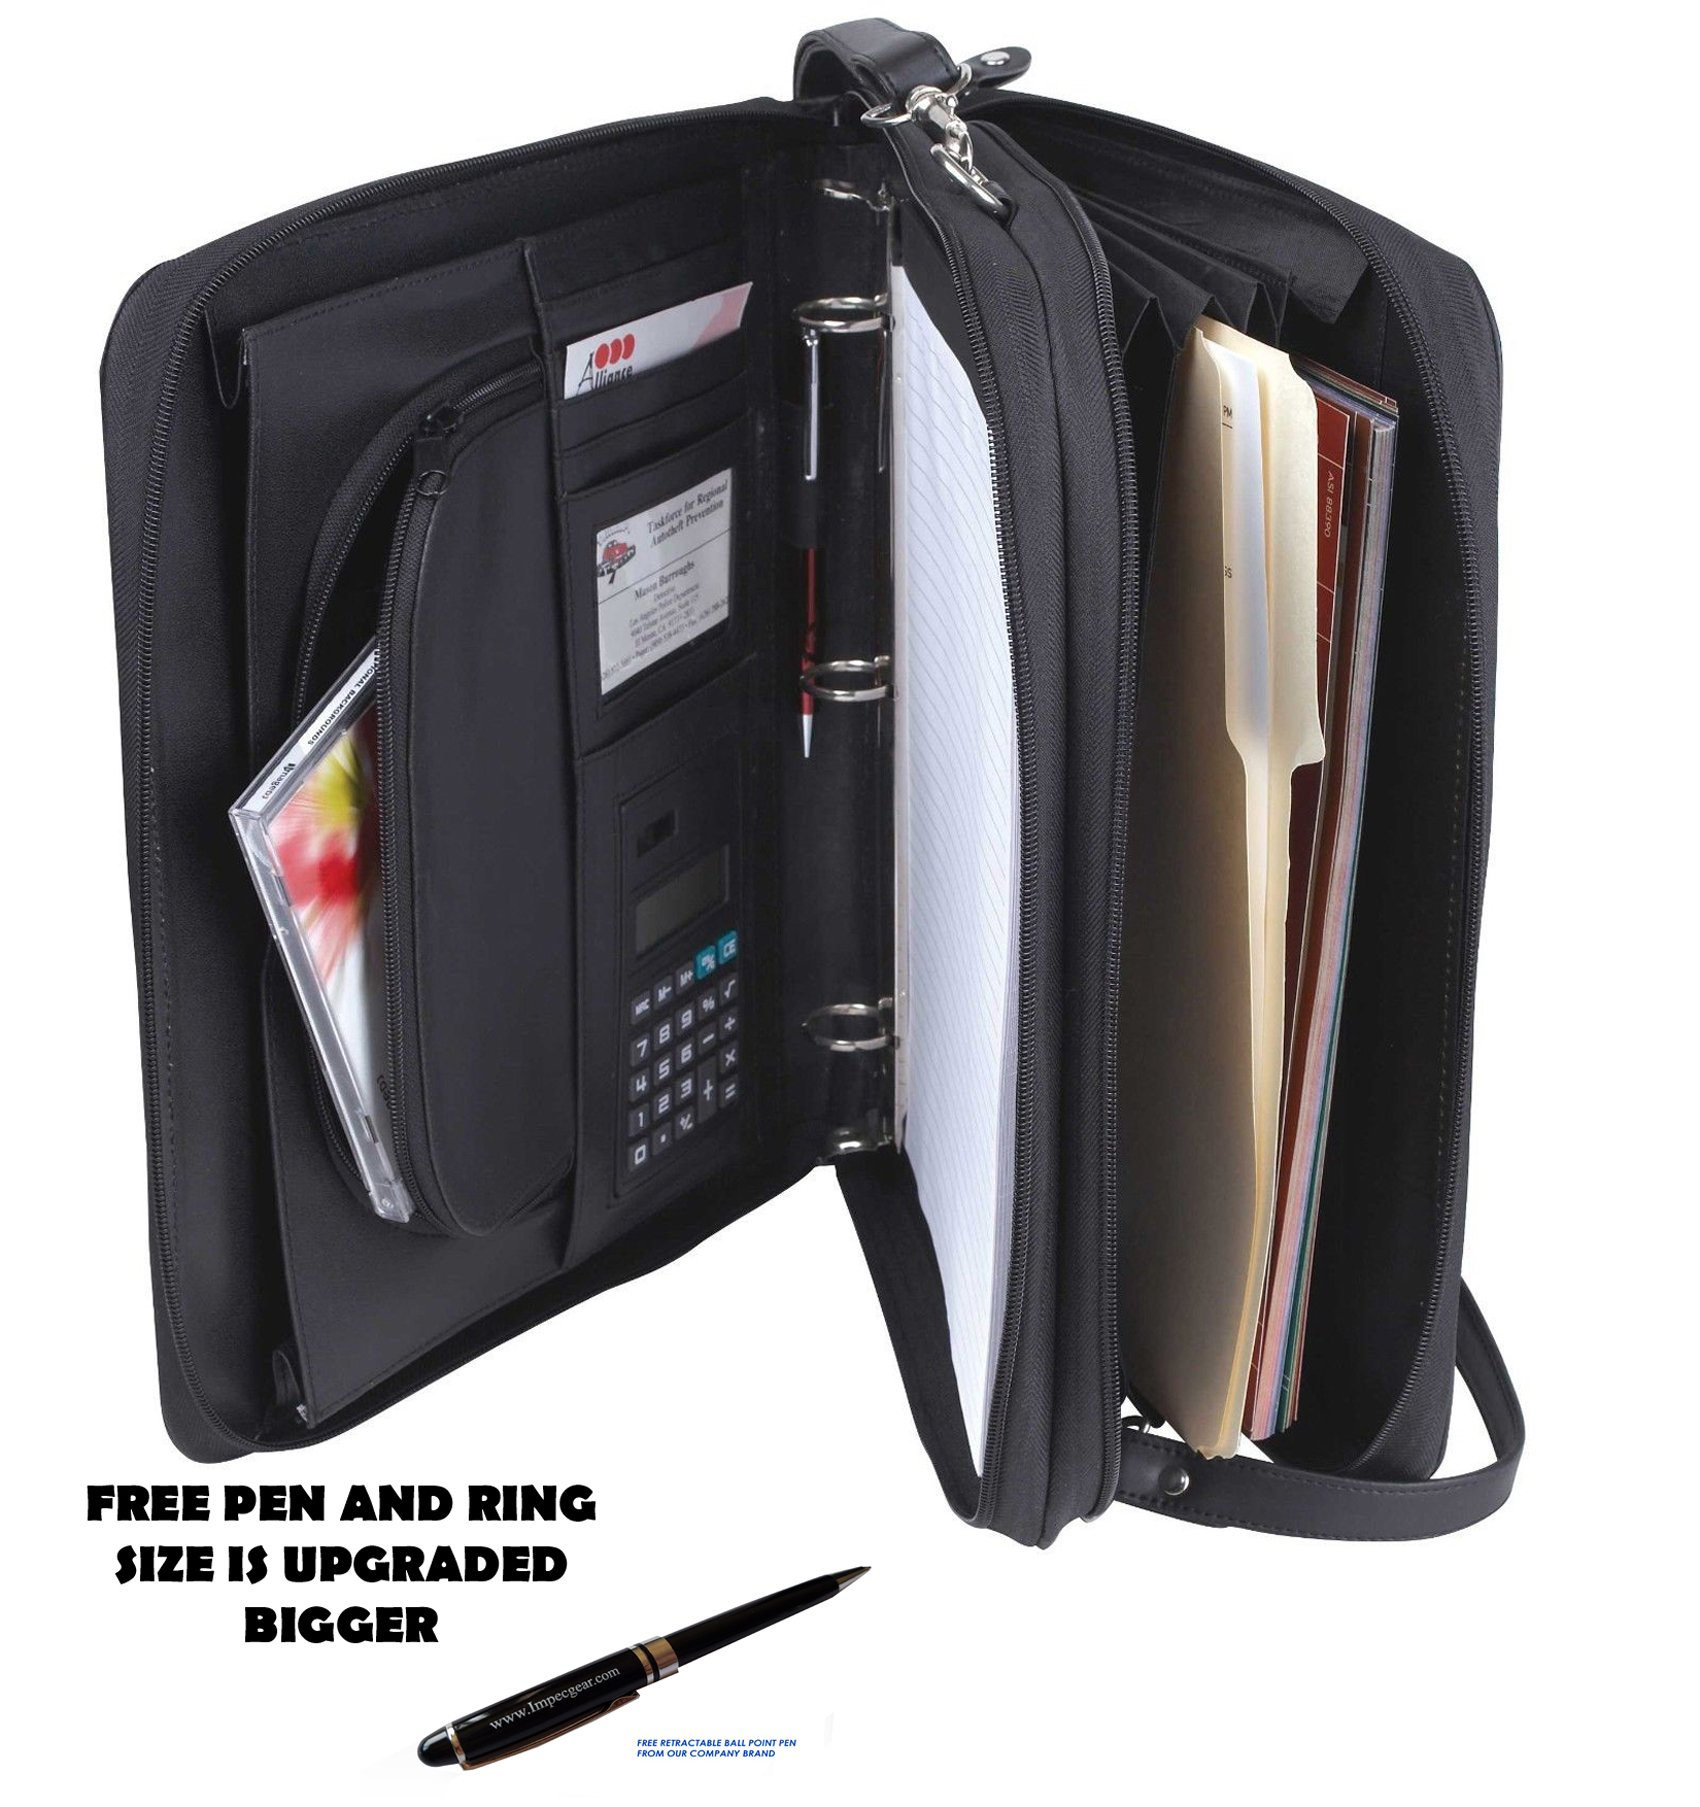 Padfolio 3-Ring Binders, Folder File Divider Organizer Planner w/Smart Handle, Briefcase Luggage Portfolio (1.5'' Inches Ring - Bigger)